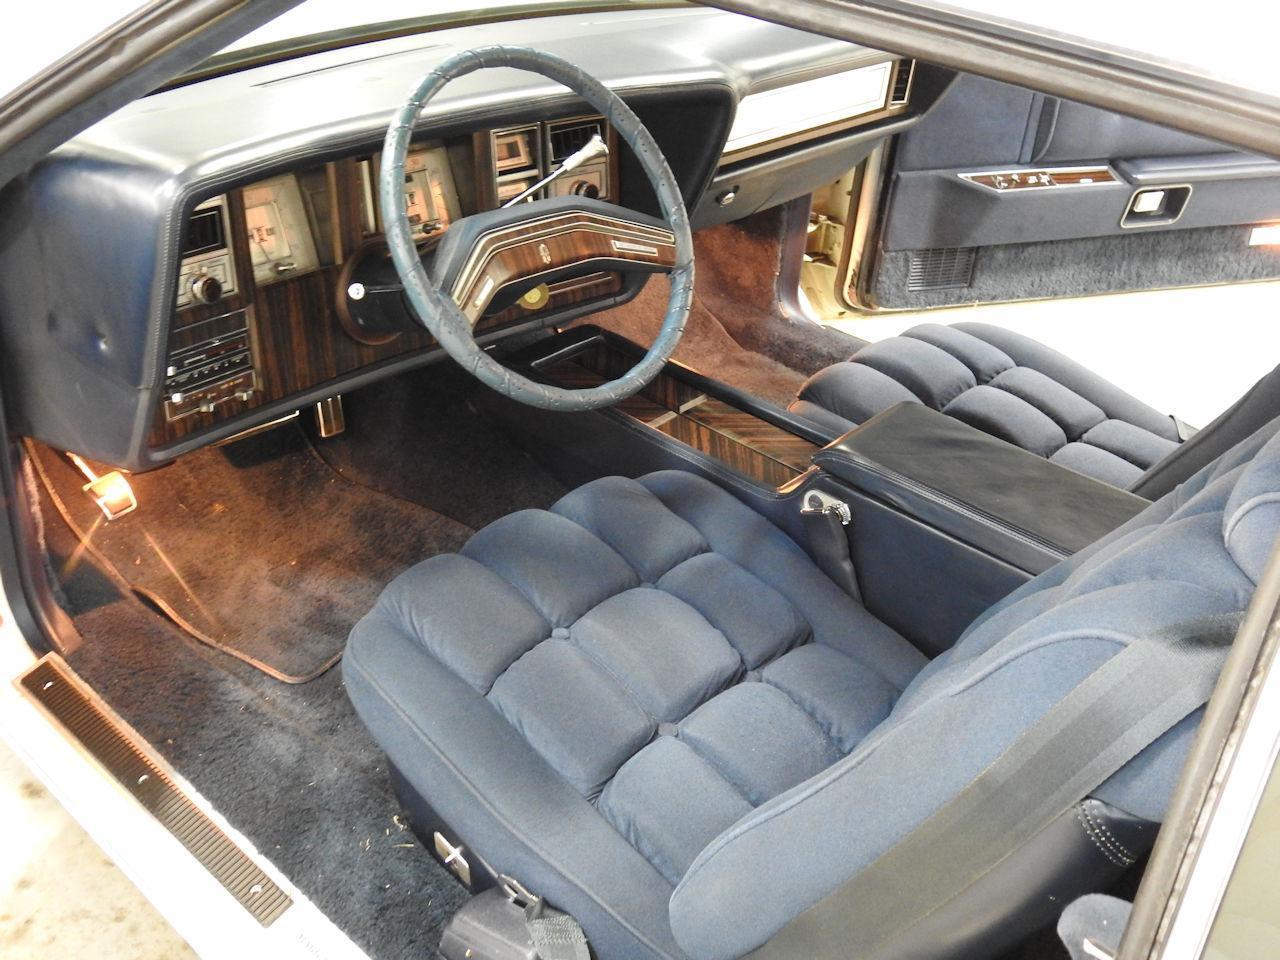 1979 Lincoln MKV 17